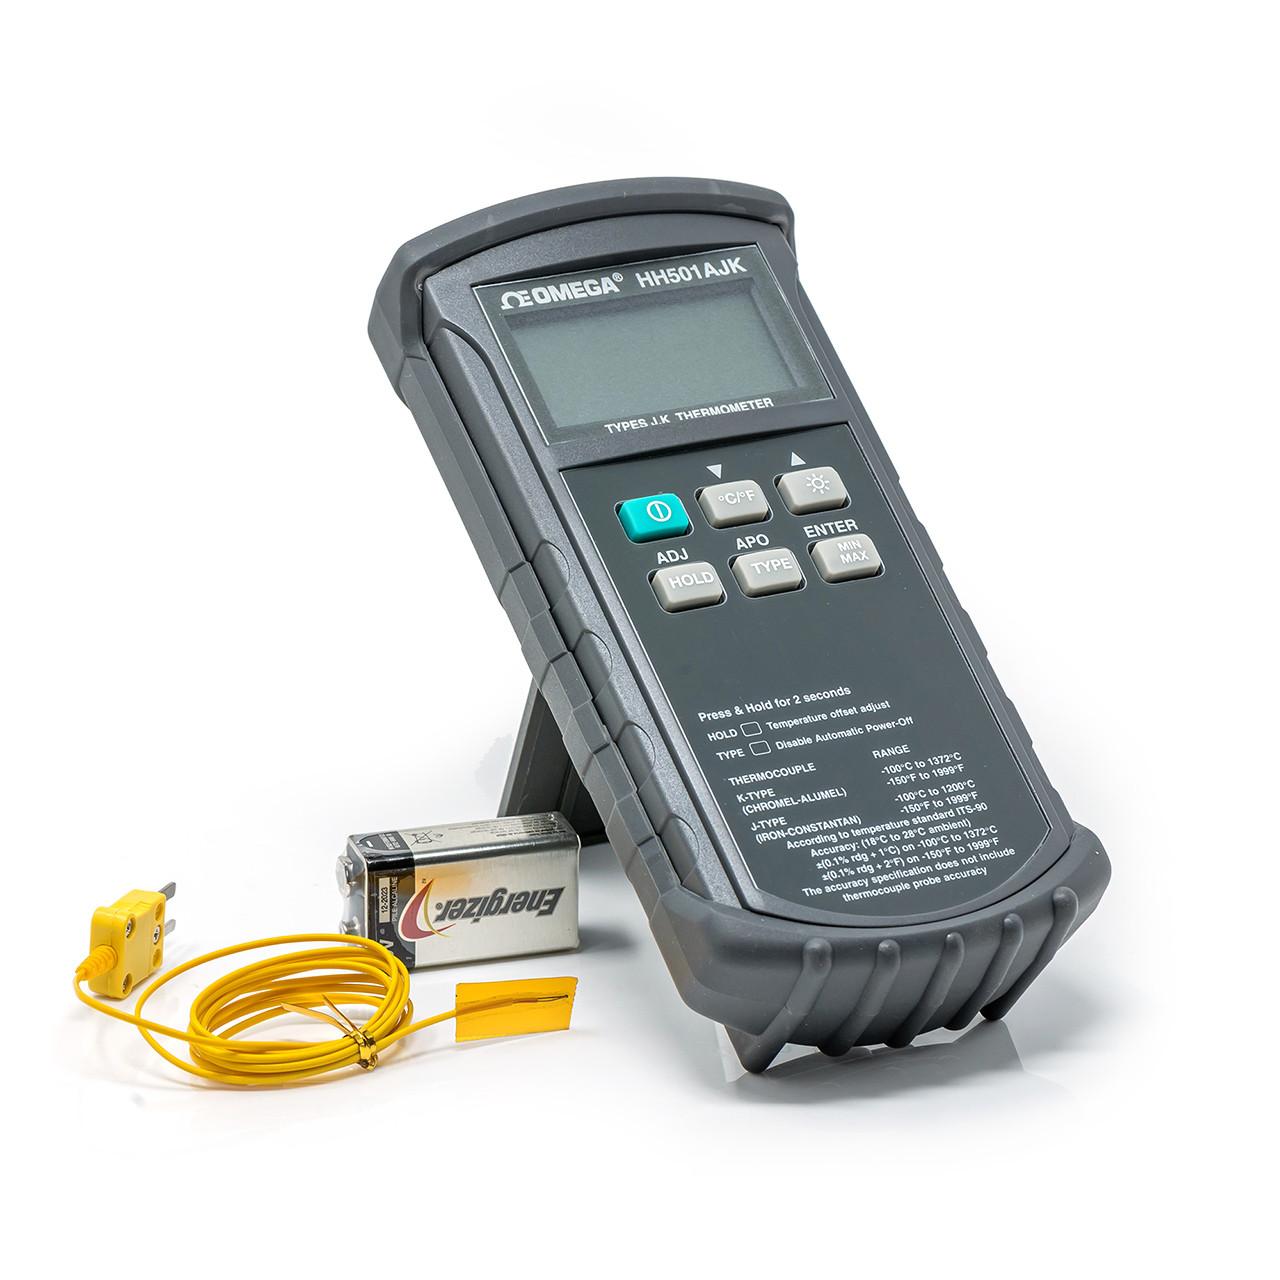 Handheld Digital Thermometer